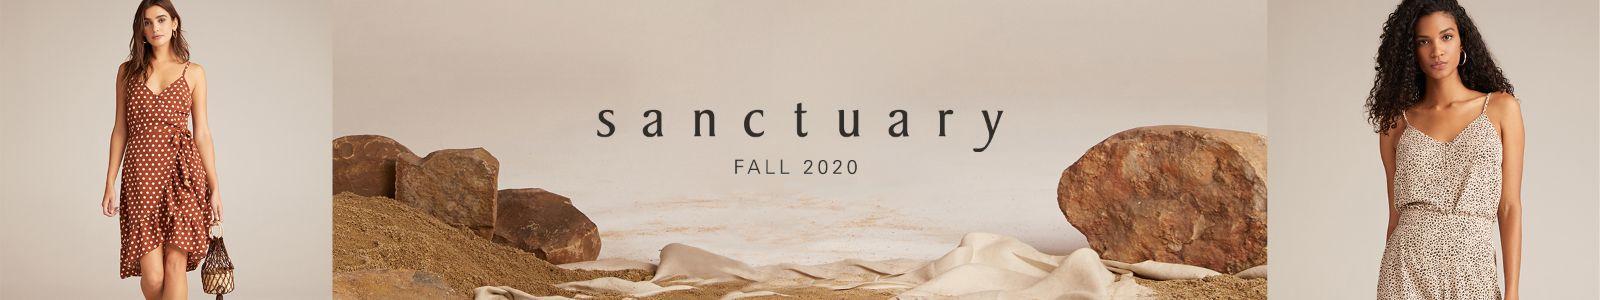 Sanctuary, Fall 2020